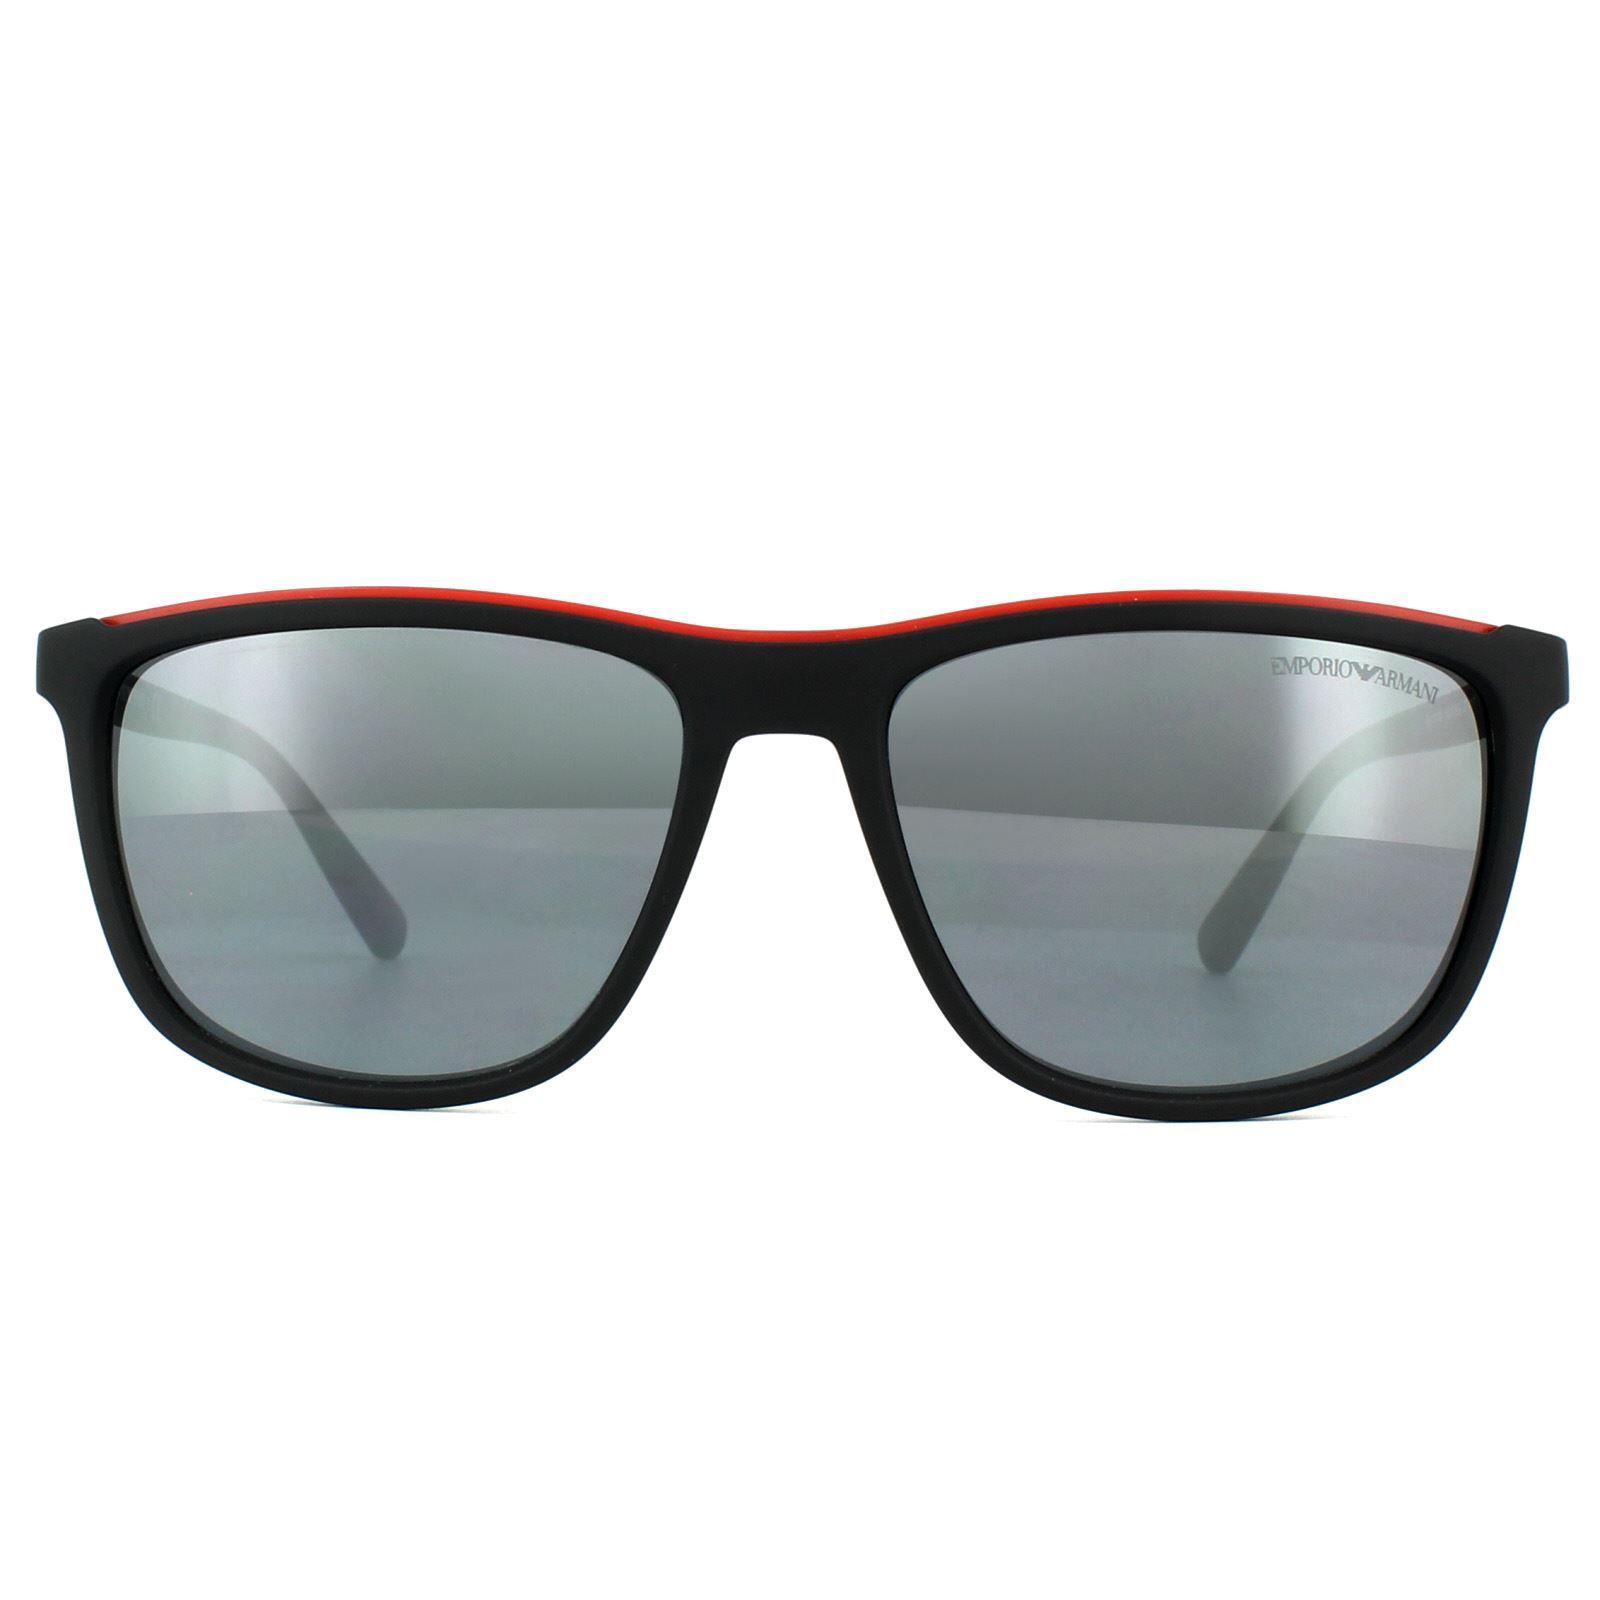 Emporio Armani Sunglasses EA4109 50426G Matt Black Light Grey Mirror Black